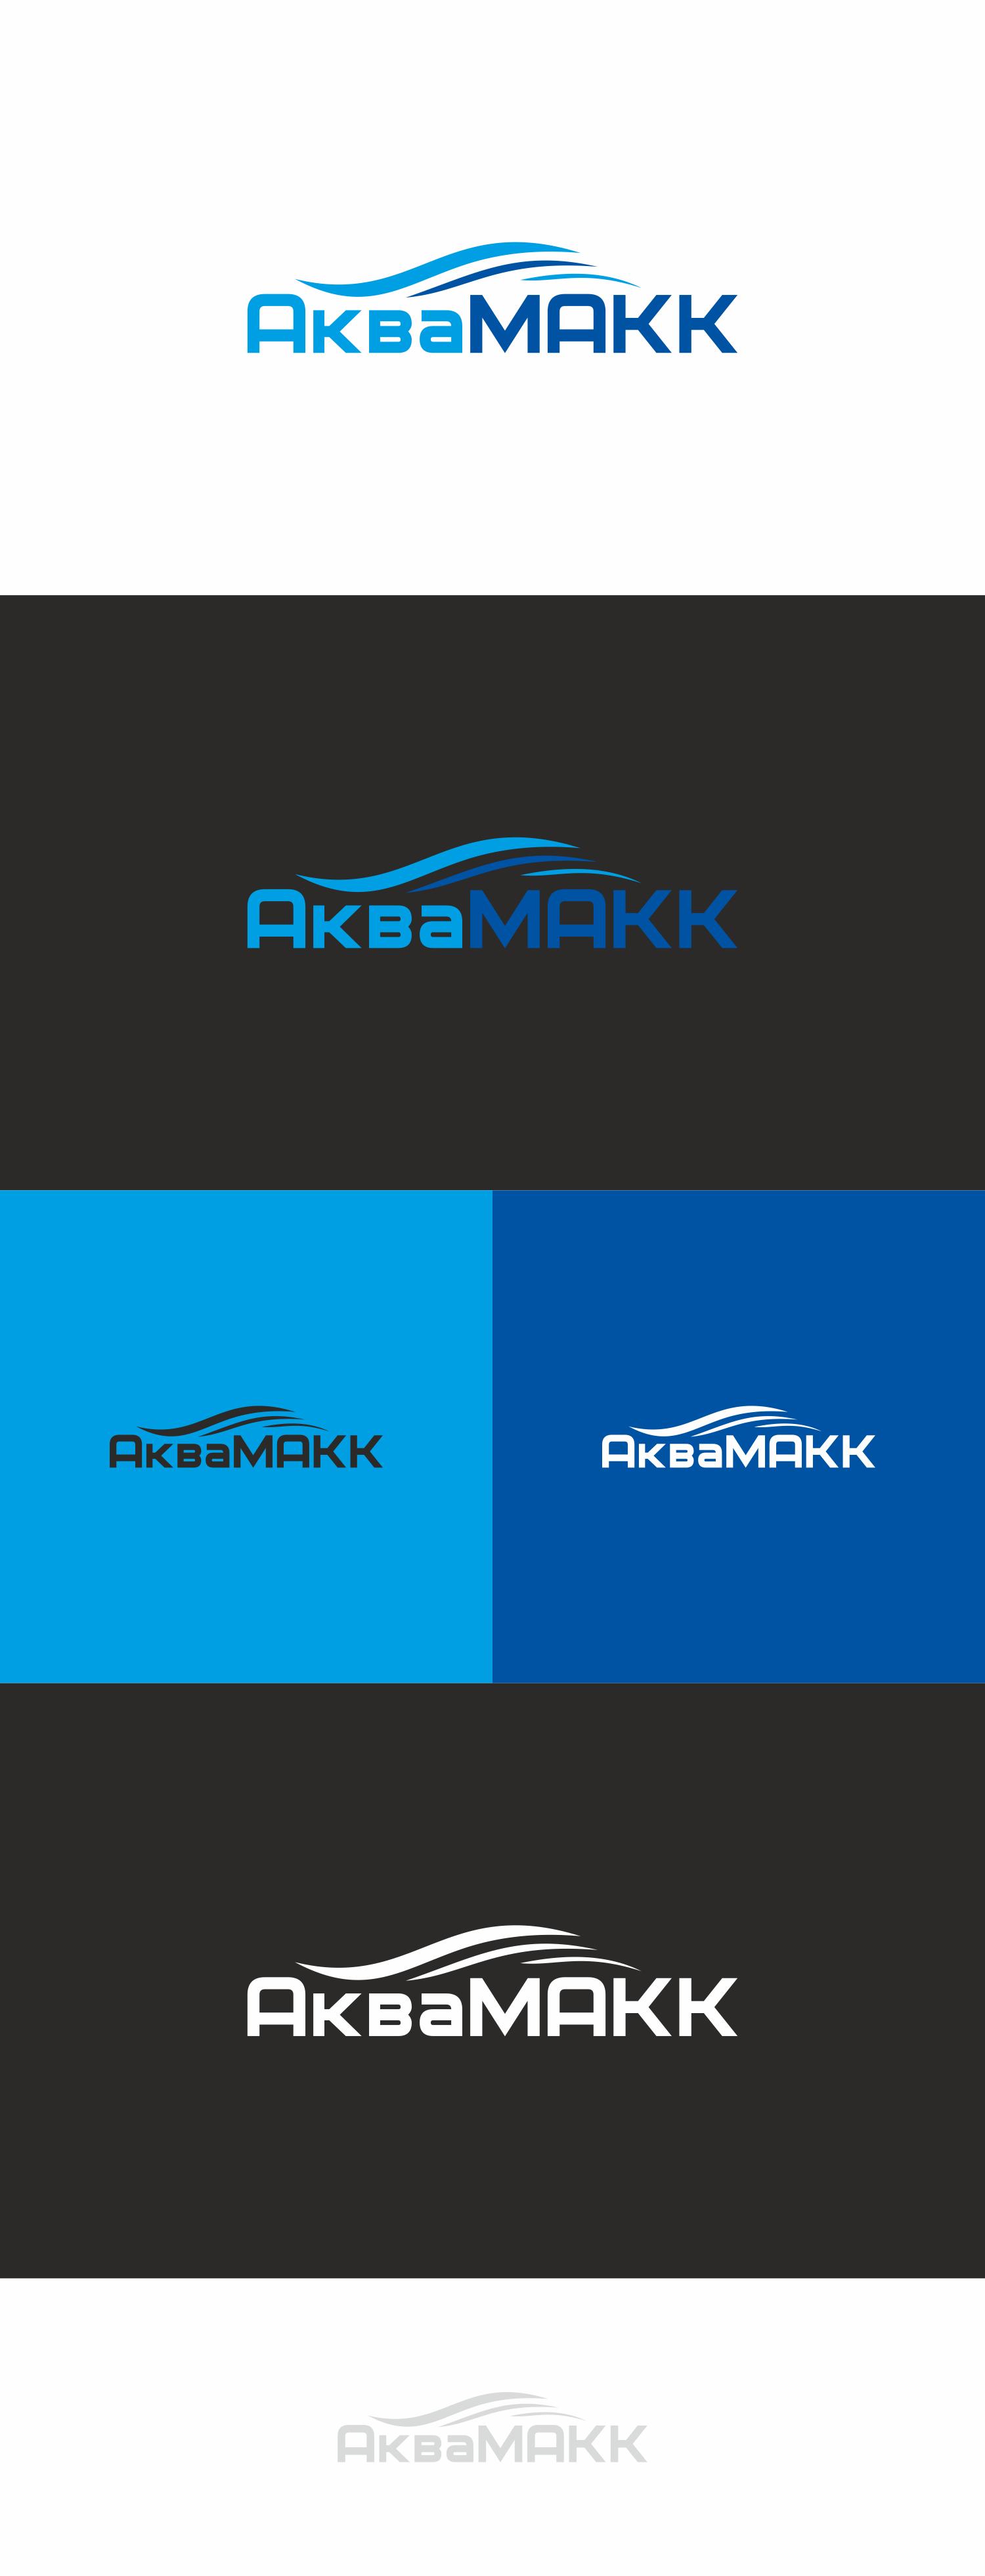 Разработка логотипа для линейки продуктов в стиле леттеринг фото f_8195a0c7a2abc047.jpg